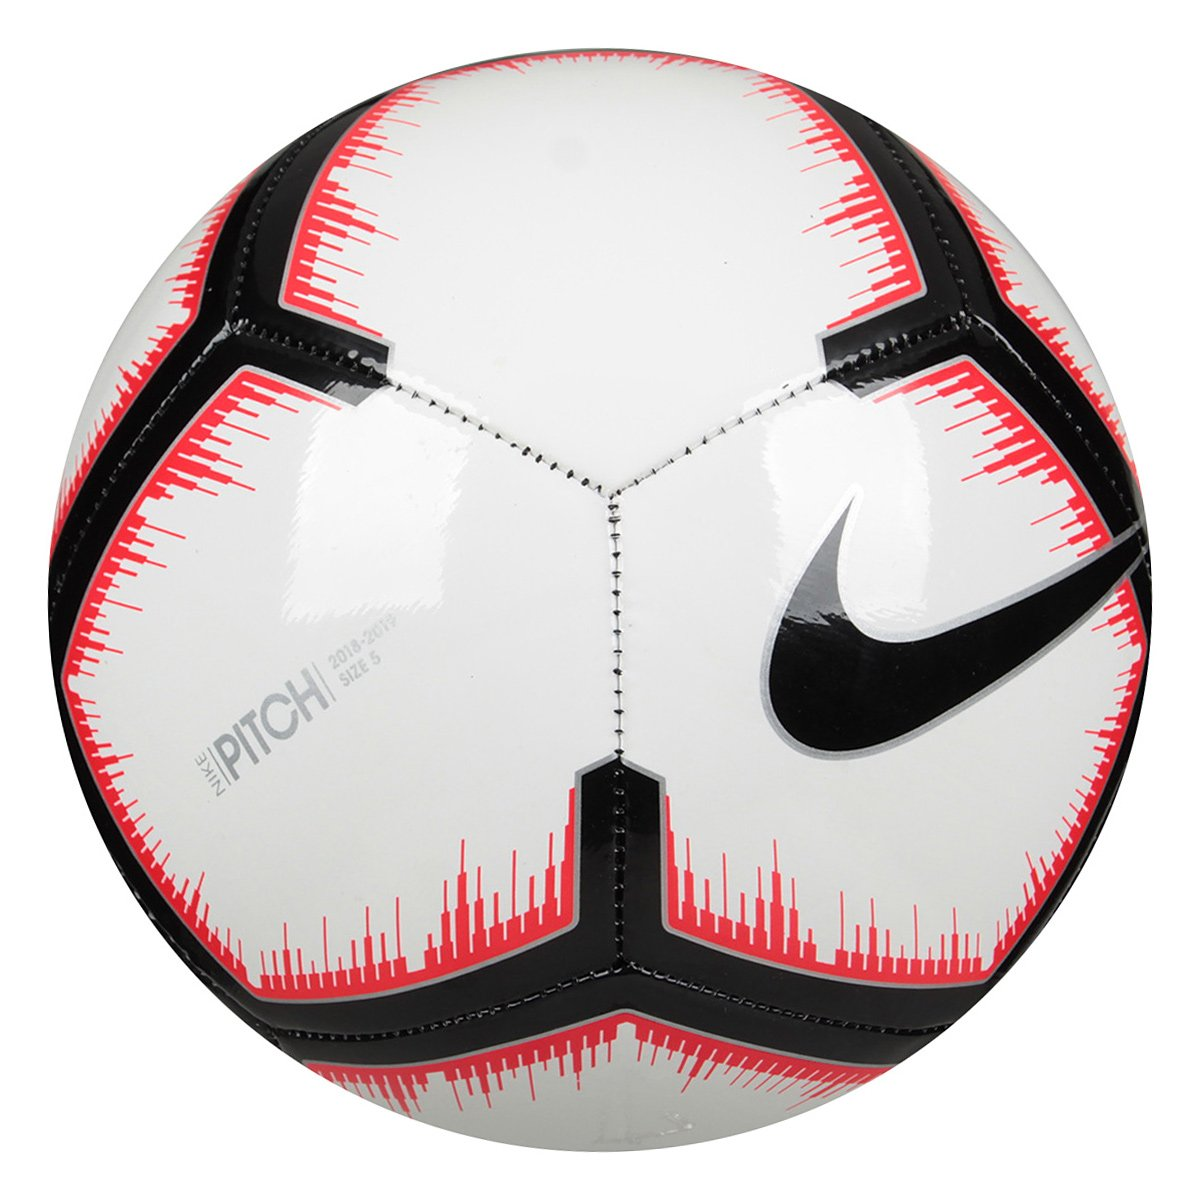 1e5e11d5e17f1 Bola de Futebol Campo Pitch Nike - Branco e Preto - Compre Agora ...